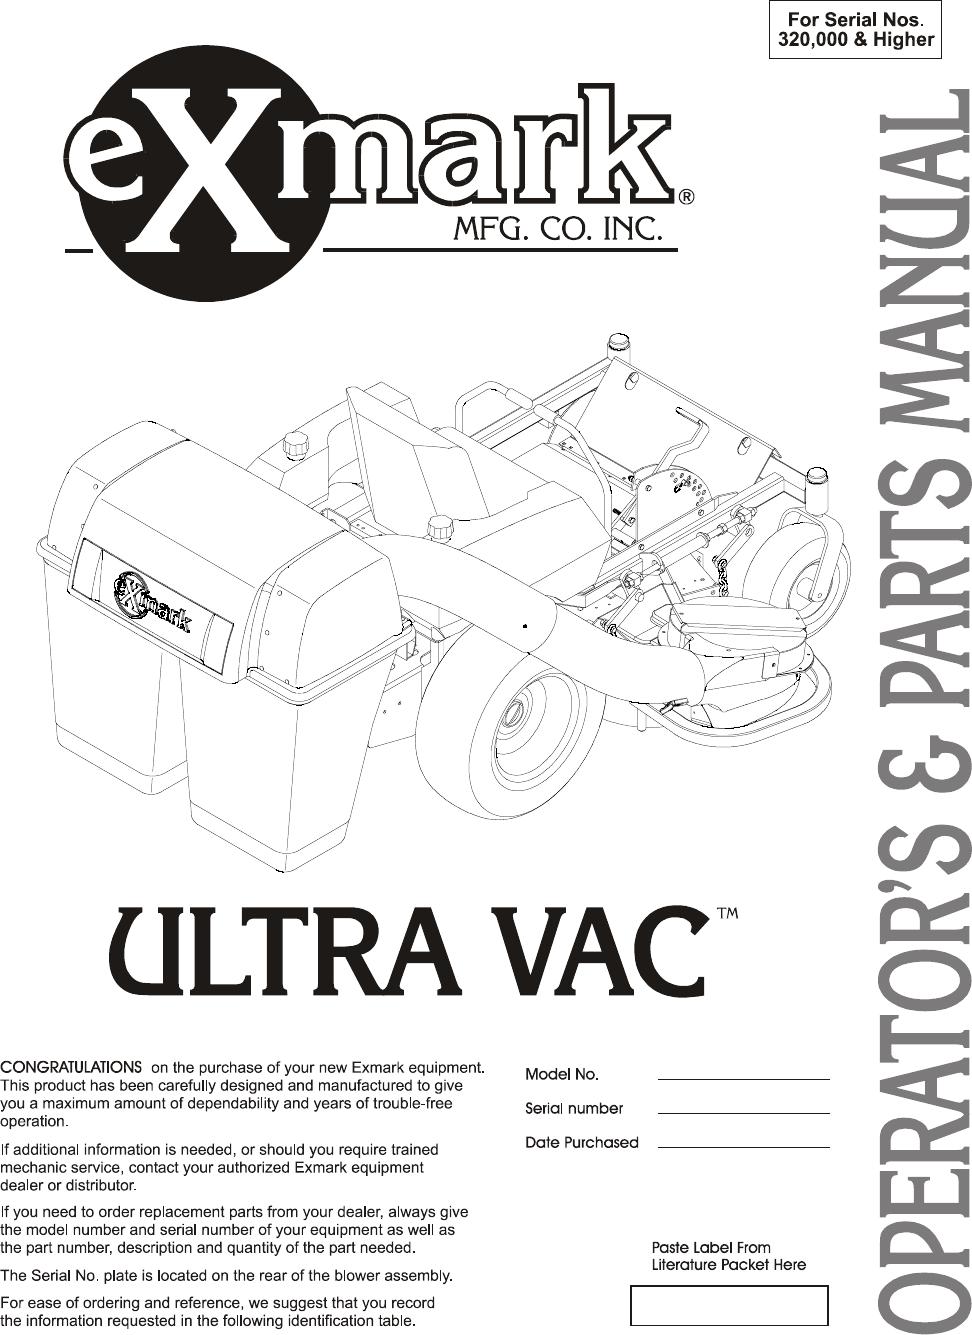 Exmark Ultra Vac Users Manual SUPPLEMENT SHEET